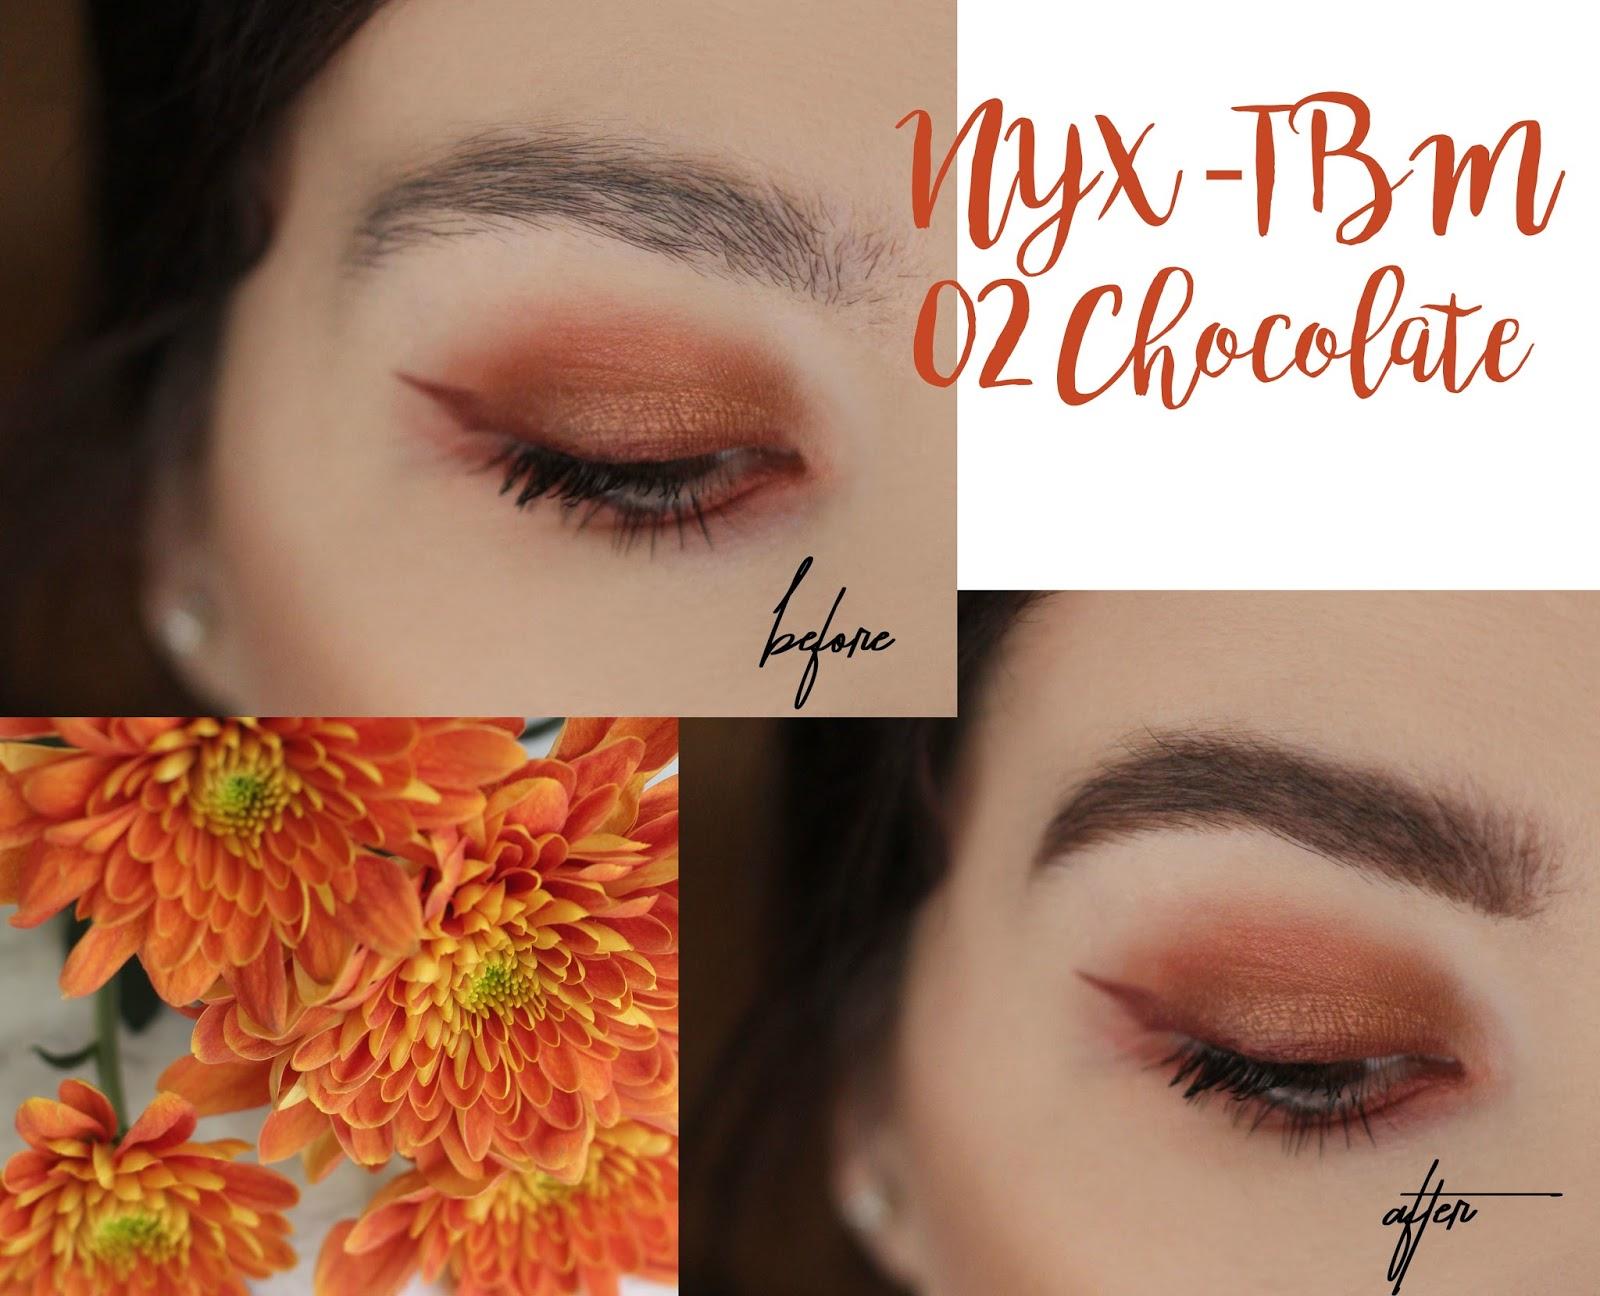 Harga Dan Spek Nyx Tinted Brow Mascara Terbaru 2018 Jaket Motor Pria Rc661 Tbm 02 Chocolate Review Another Kind Of Beauty Blog Xoxo Lovely